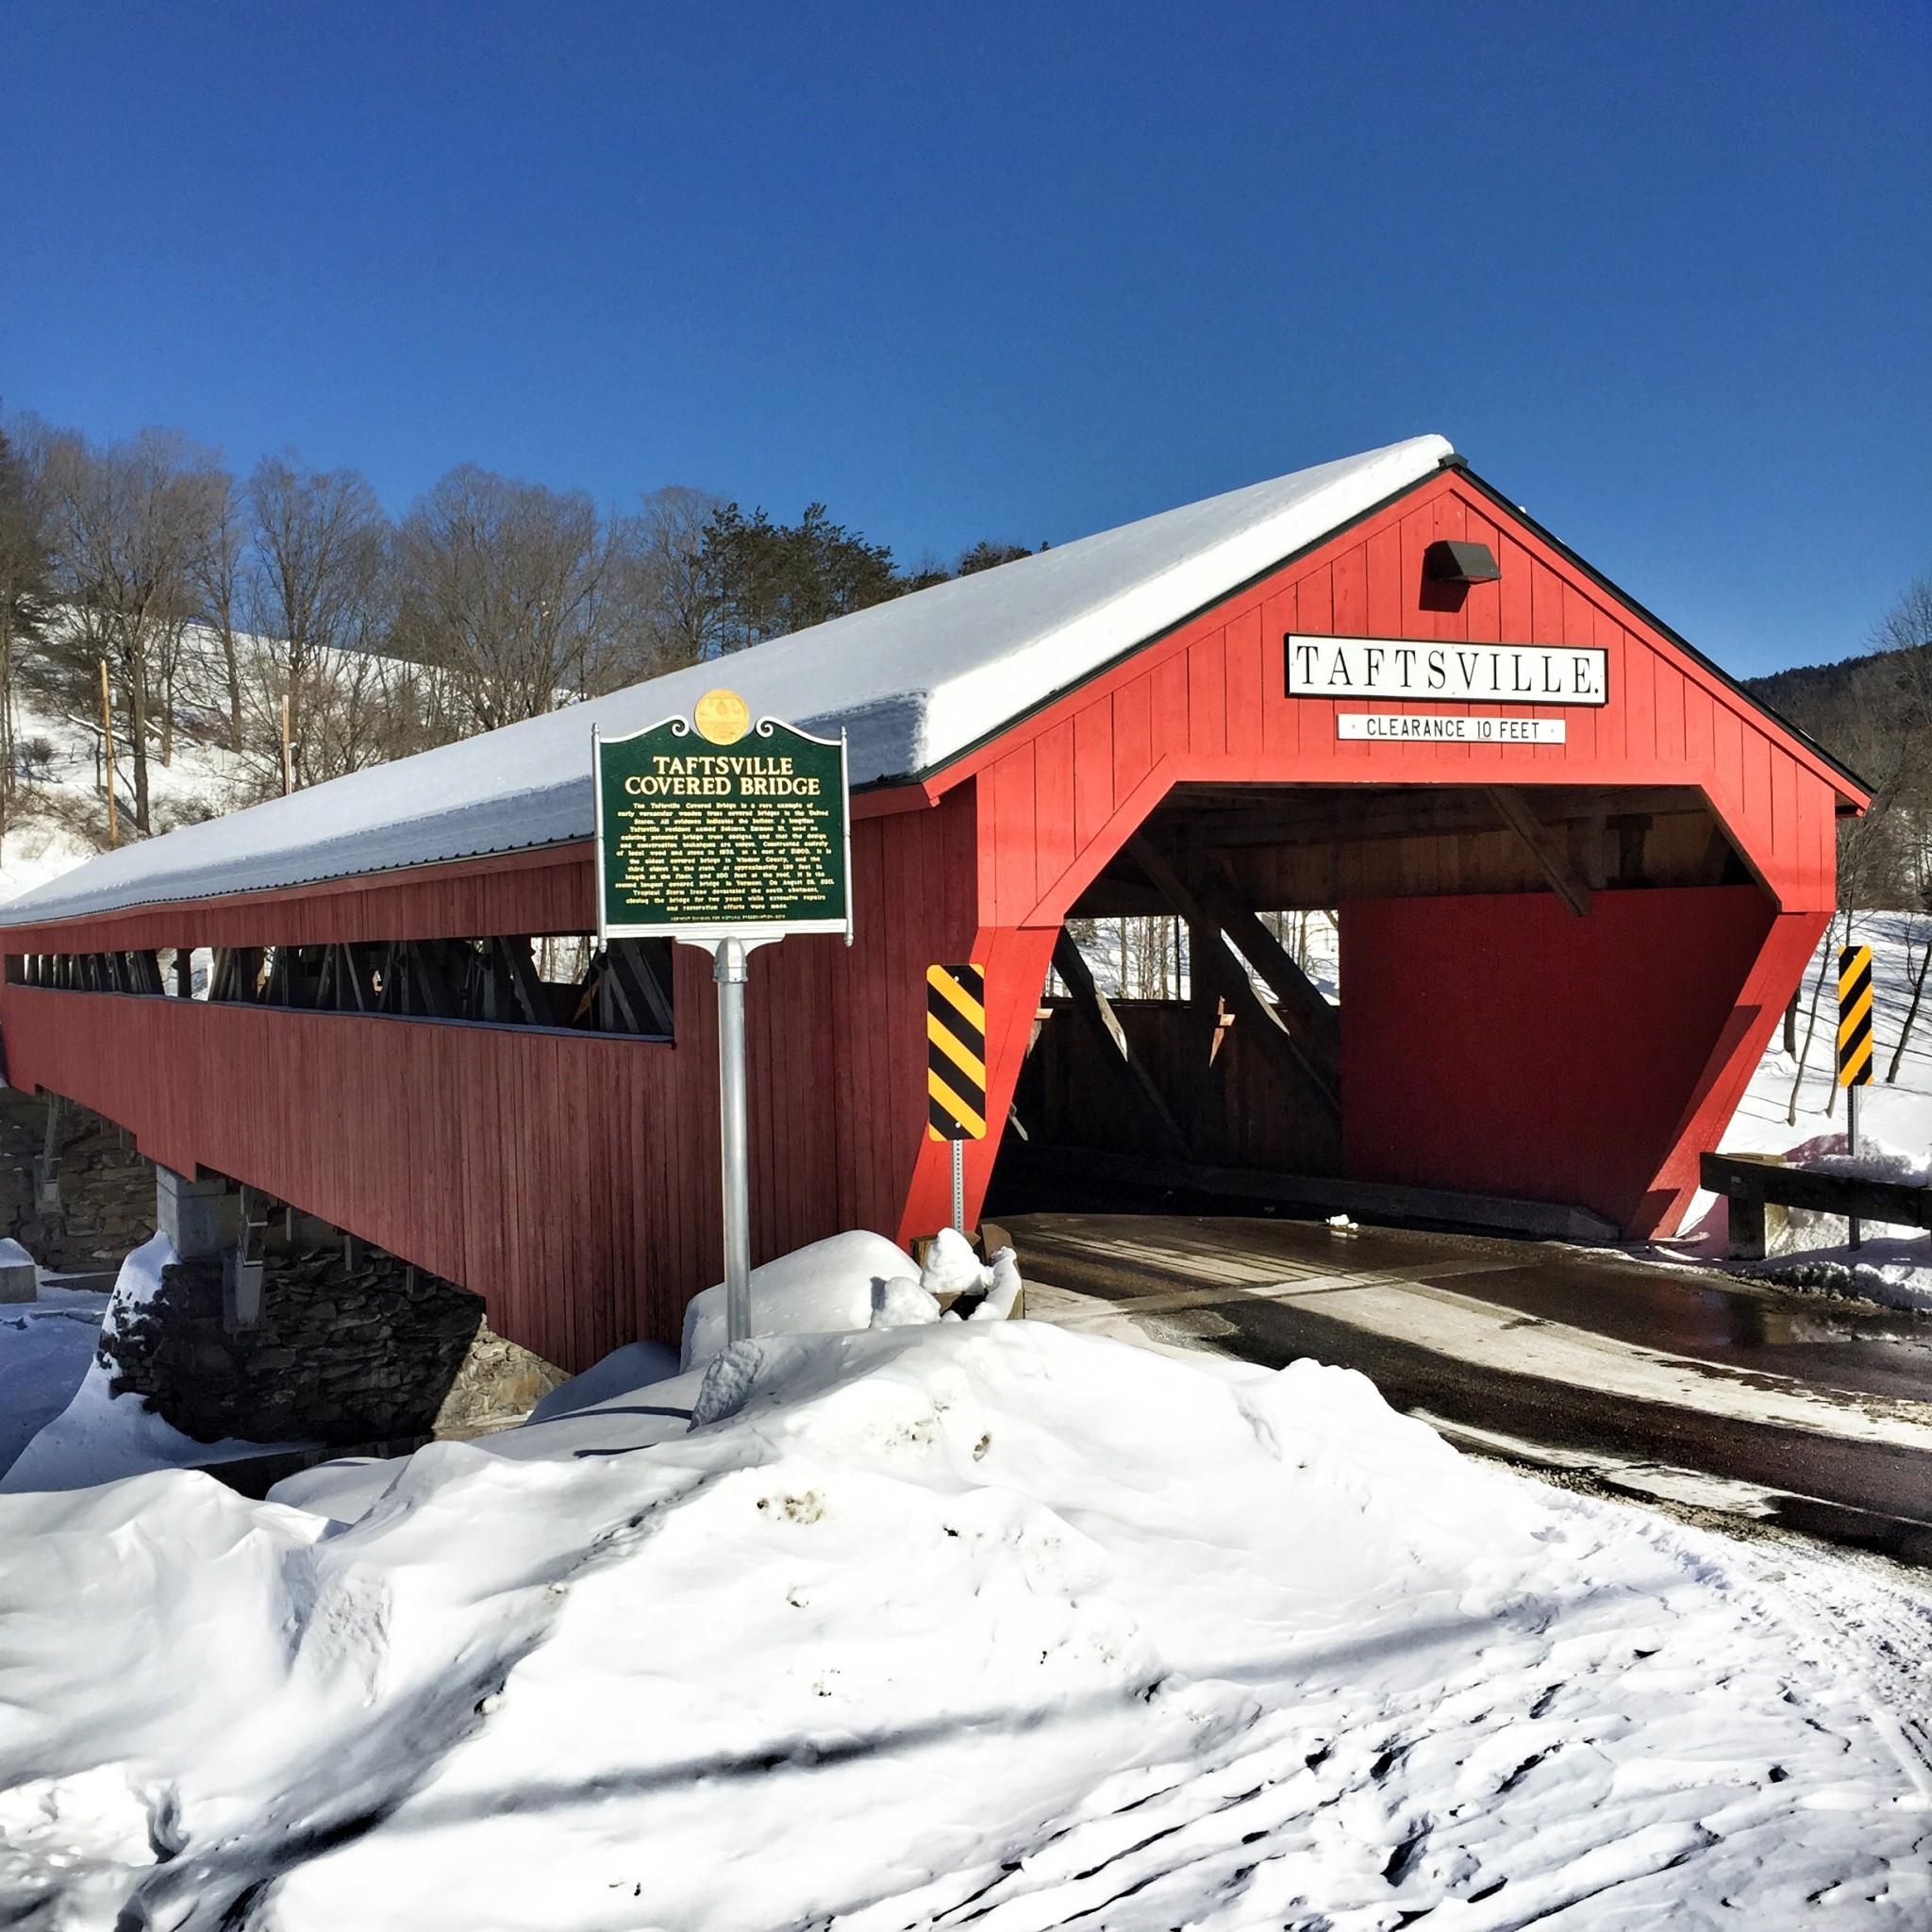 TAFTSVILLE BRIDGE, woodstock, vermont, the-alyst.com